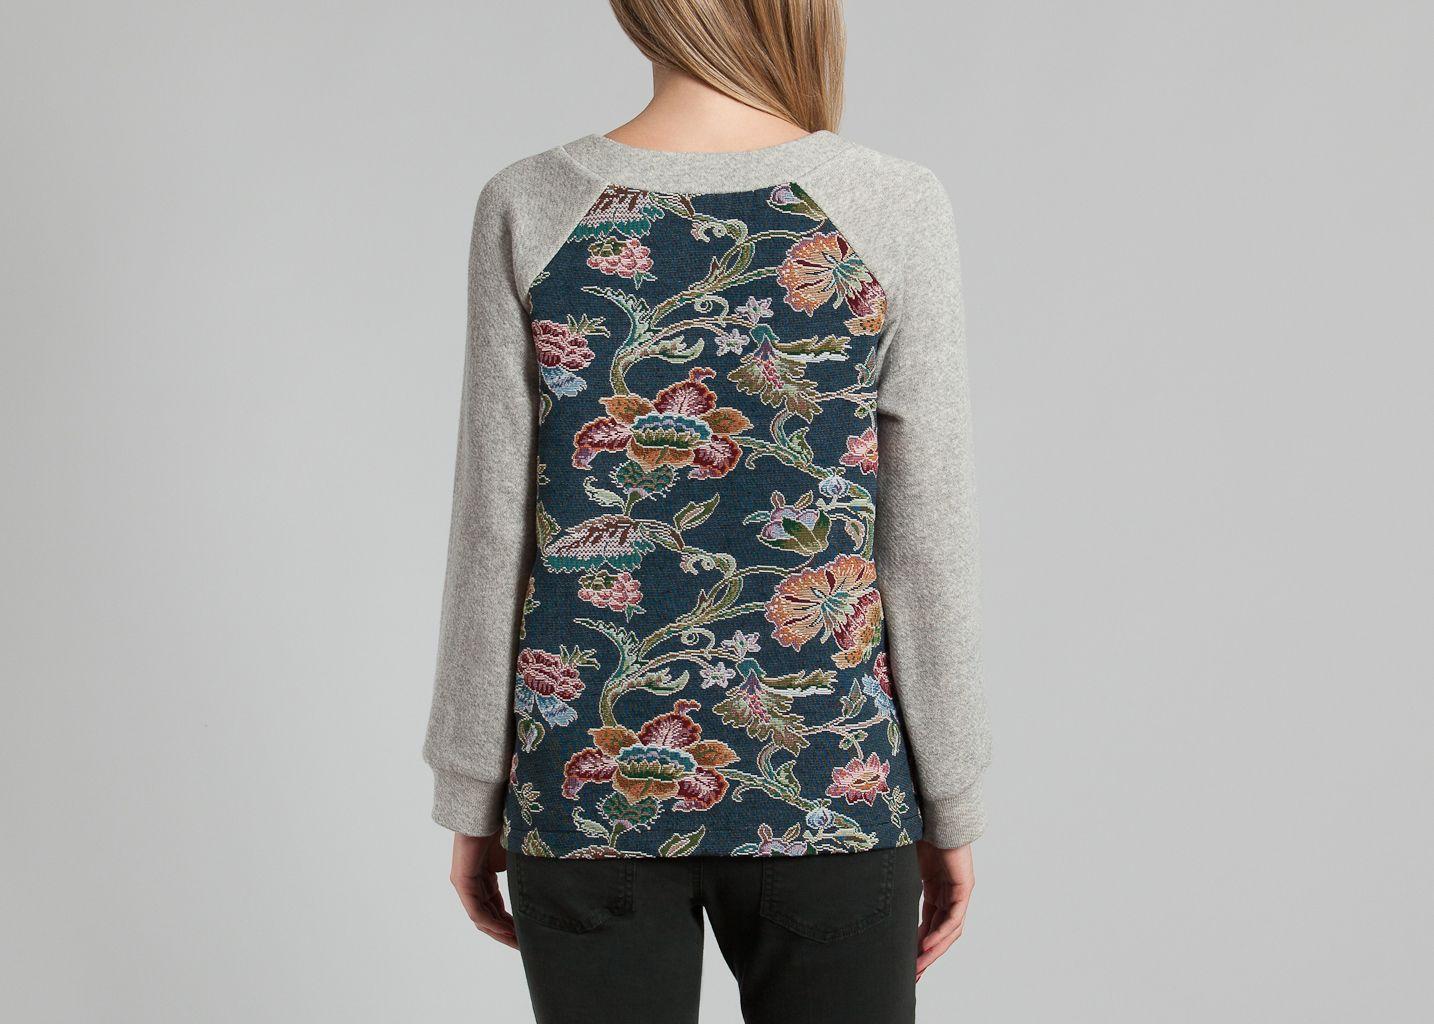 Yleana Sweater - Anna Studio